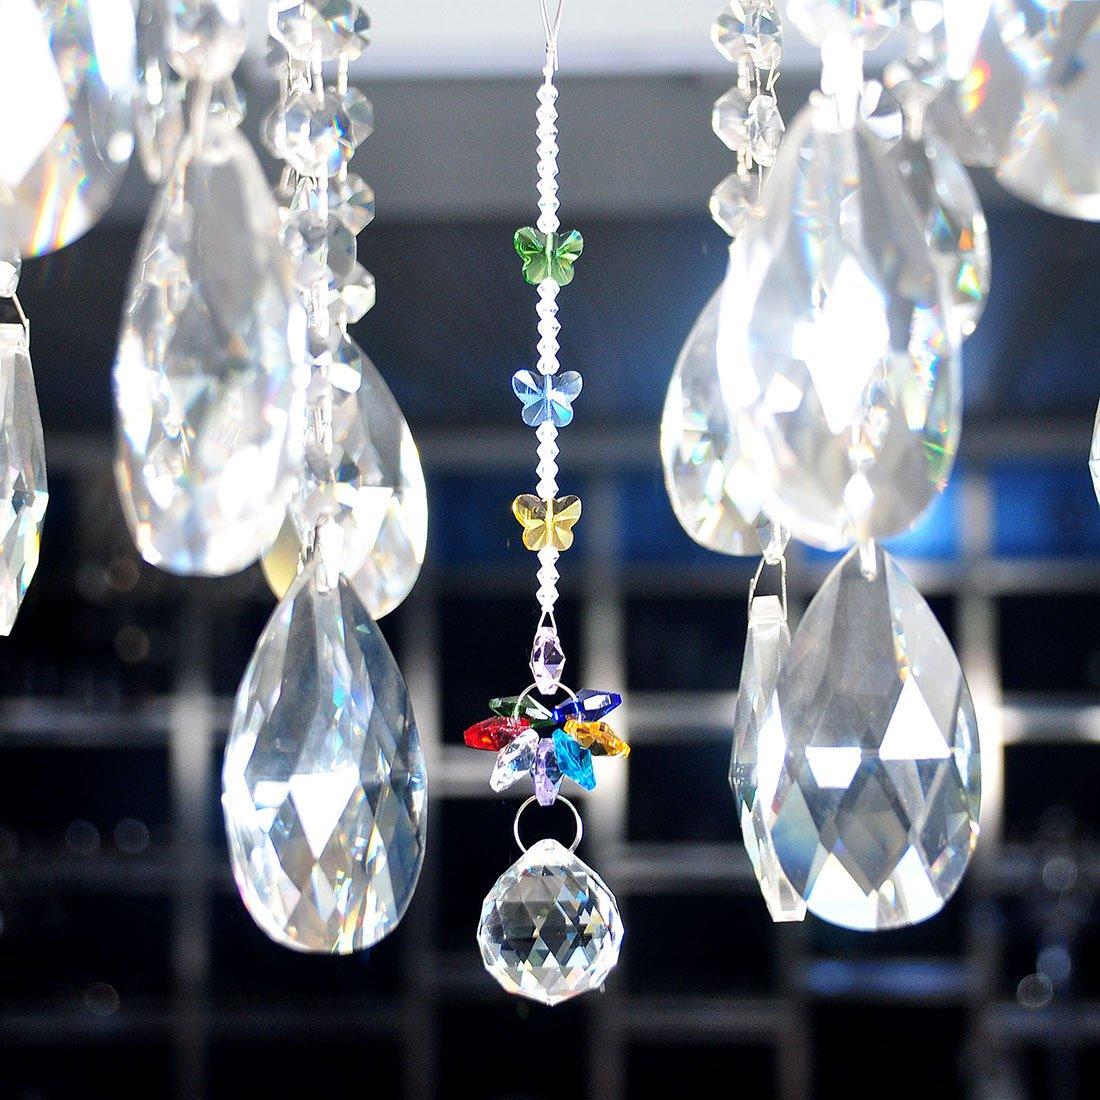 HD Handmade 30mm Crystal Ball Chandelier Prisms Butterfly ...